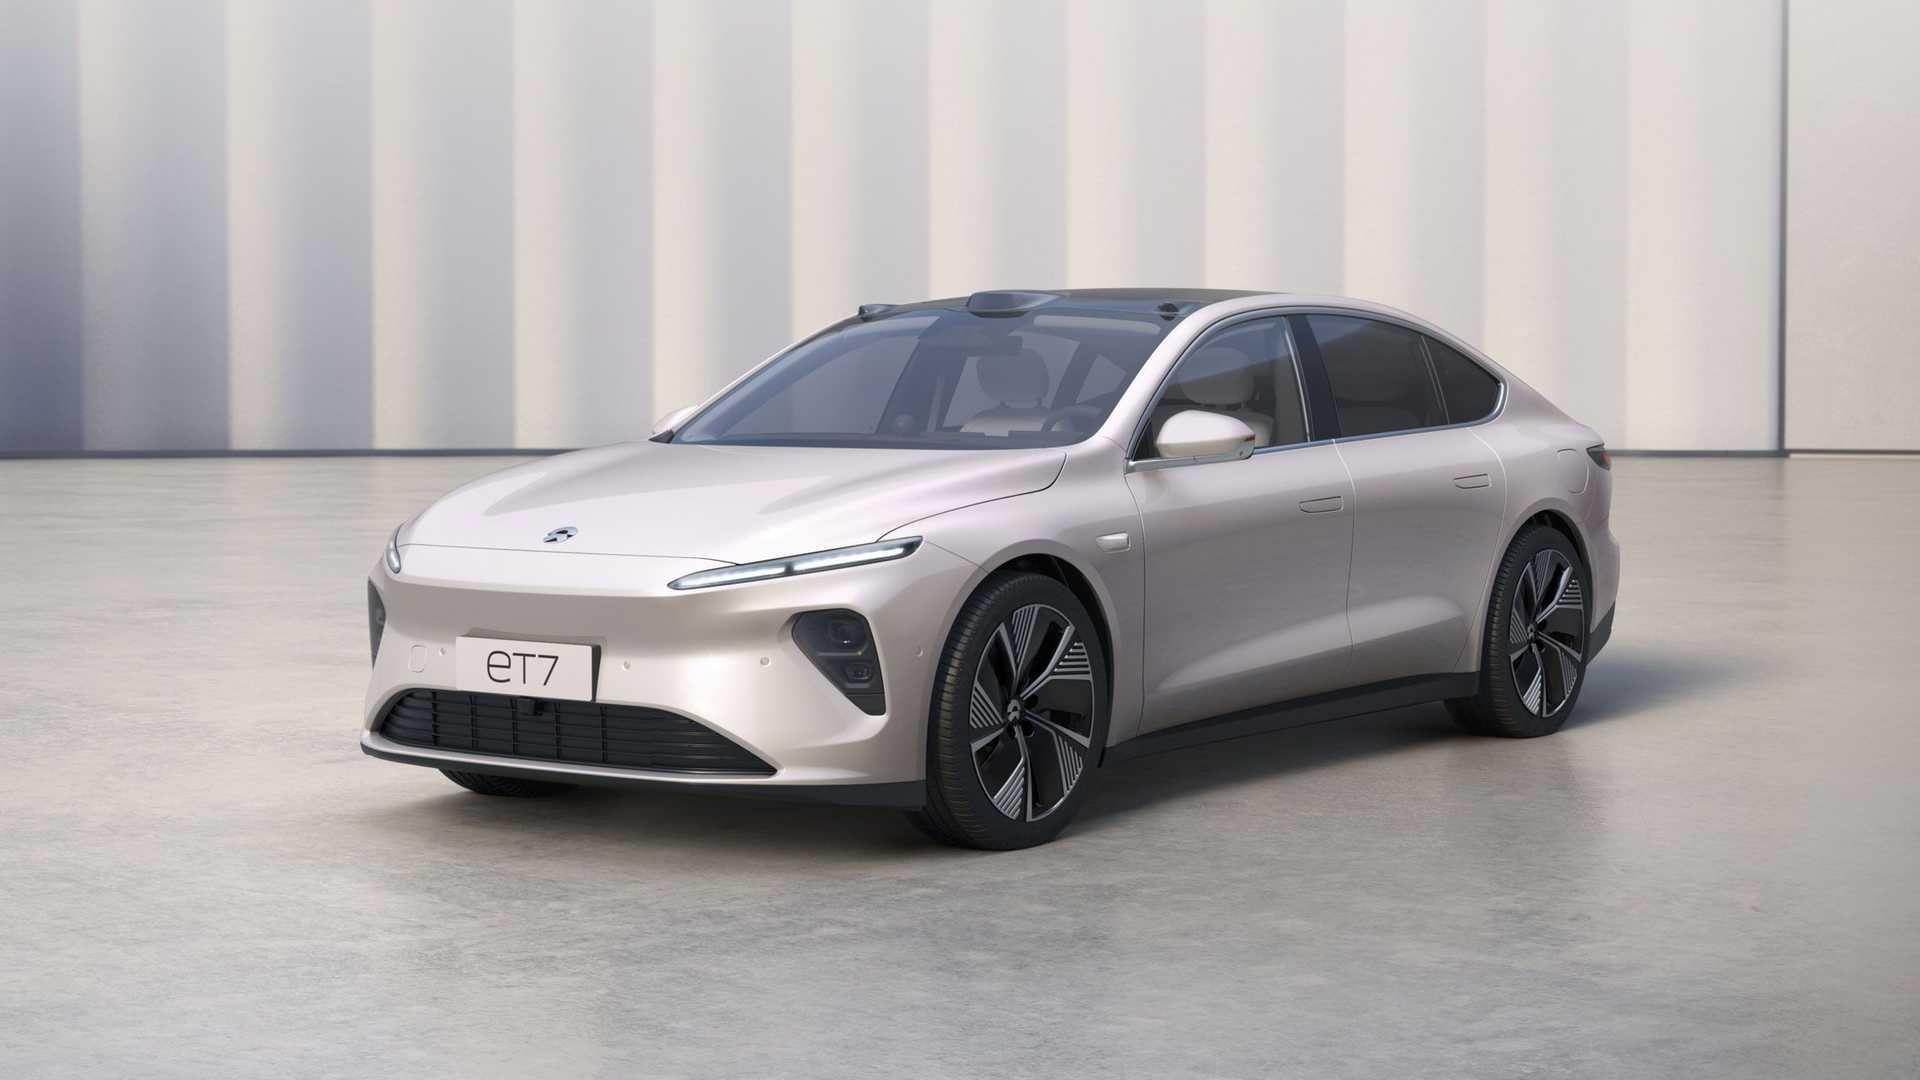 Startups de carros elétricos